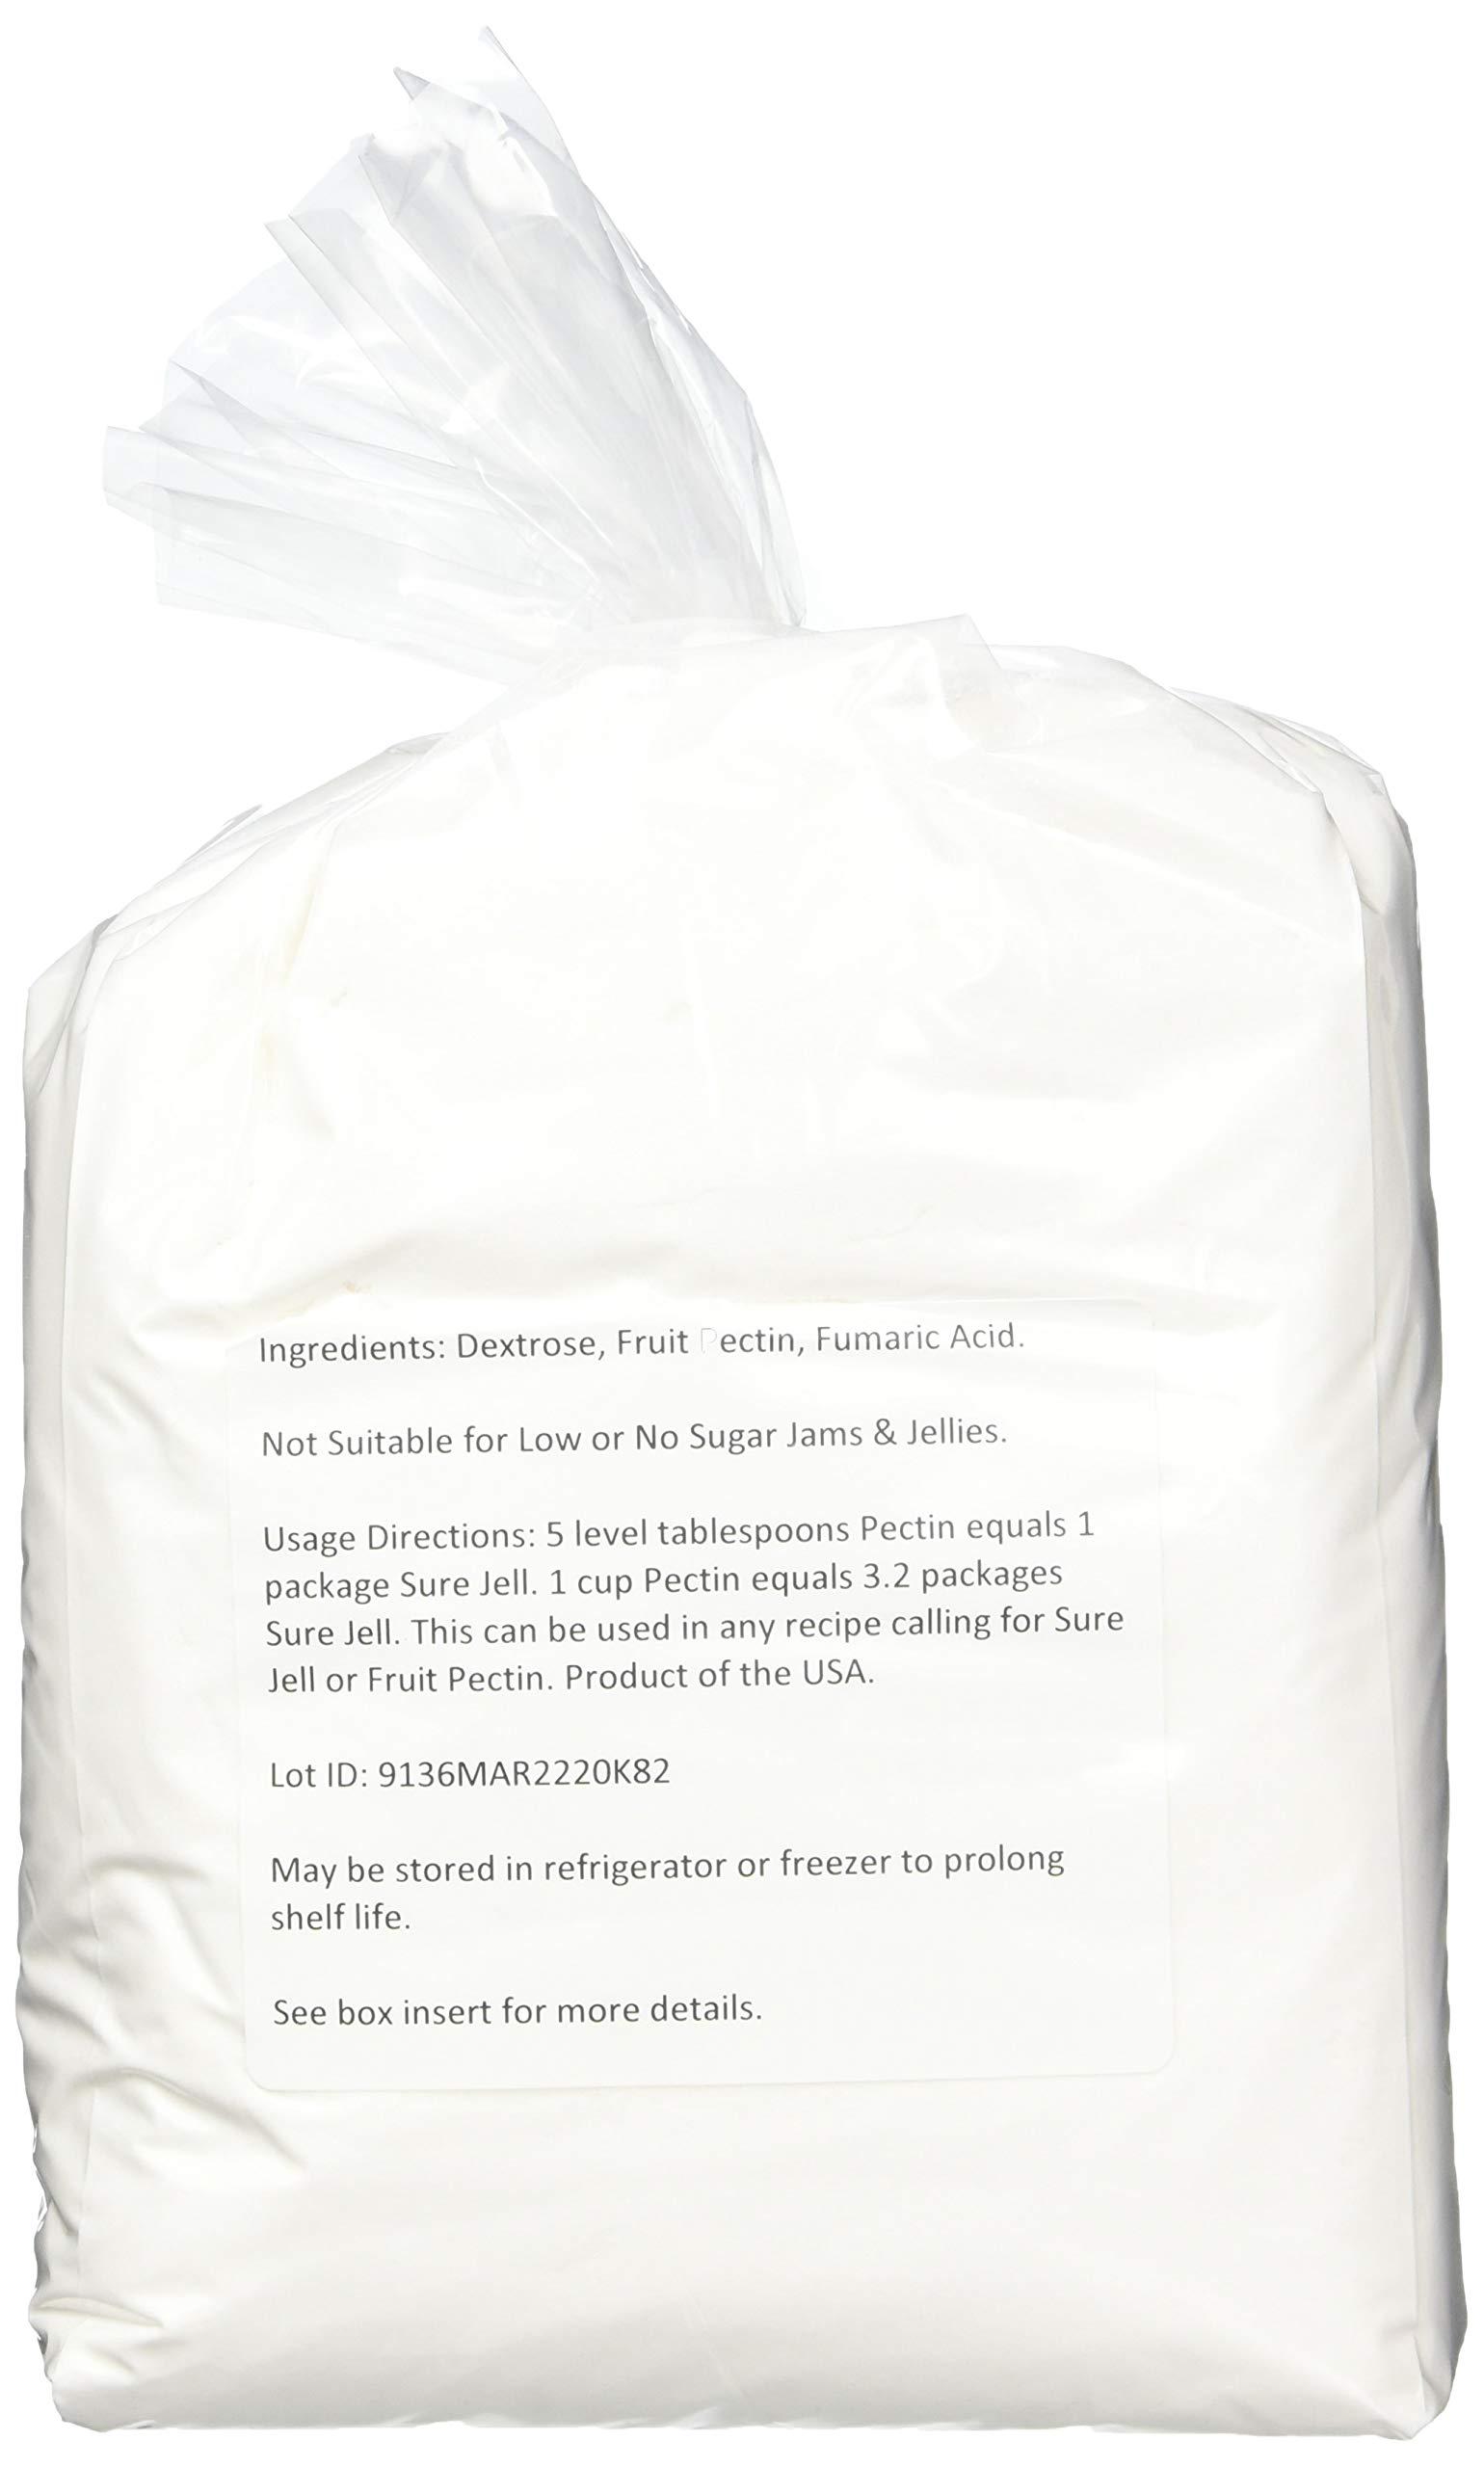 Weaver's Country Market Bulk Fruit Pectin Mix for Making Jams & Jellies (5 Lb. Plastic Bag) by Weaver's Country Market (Image #4)